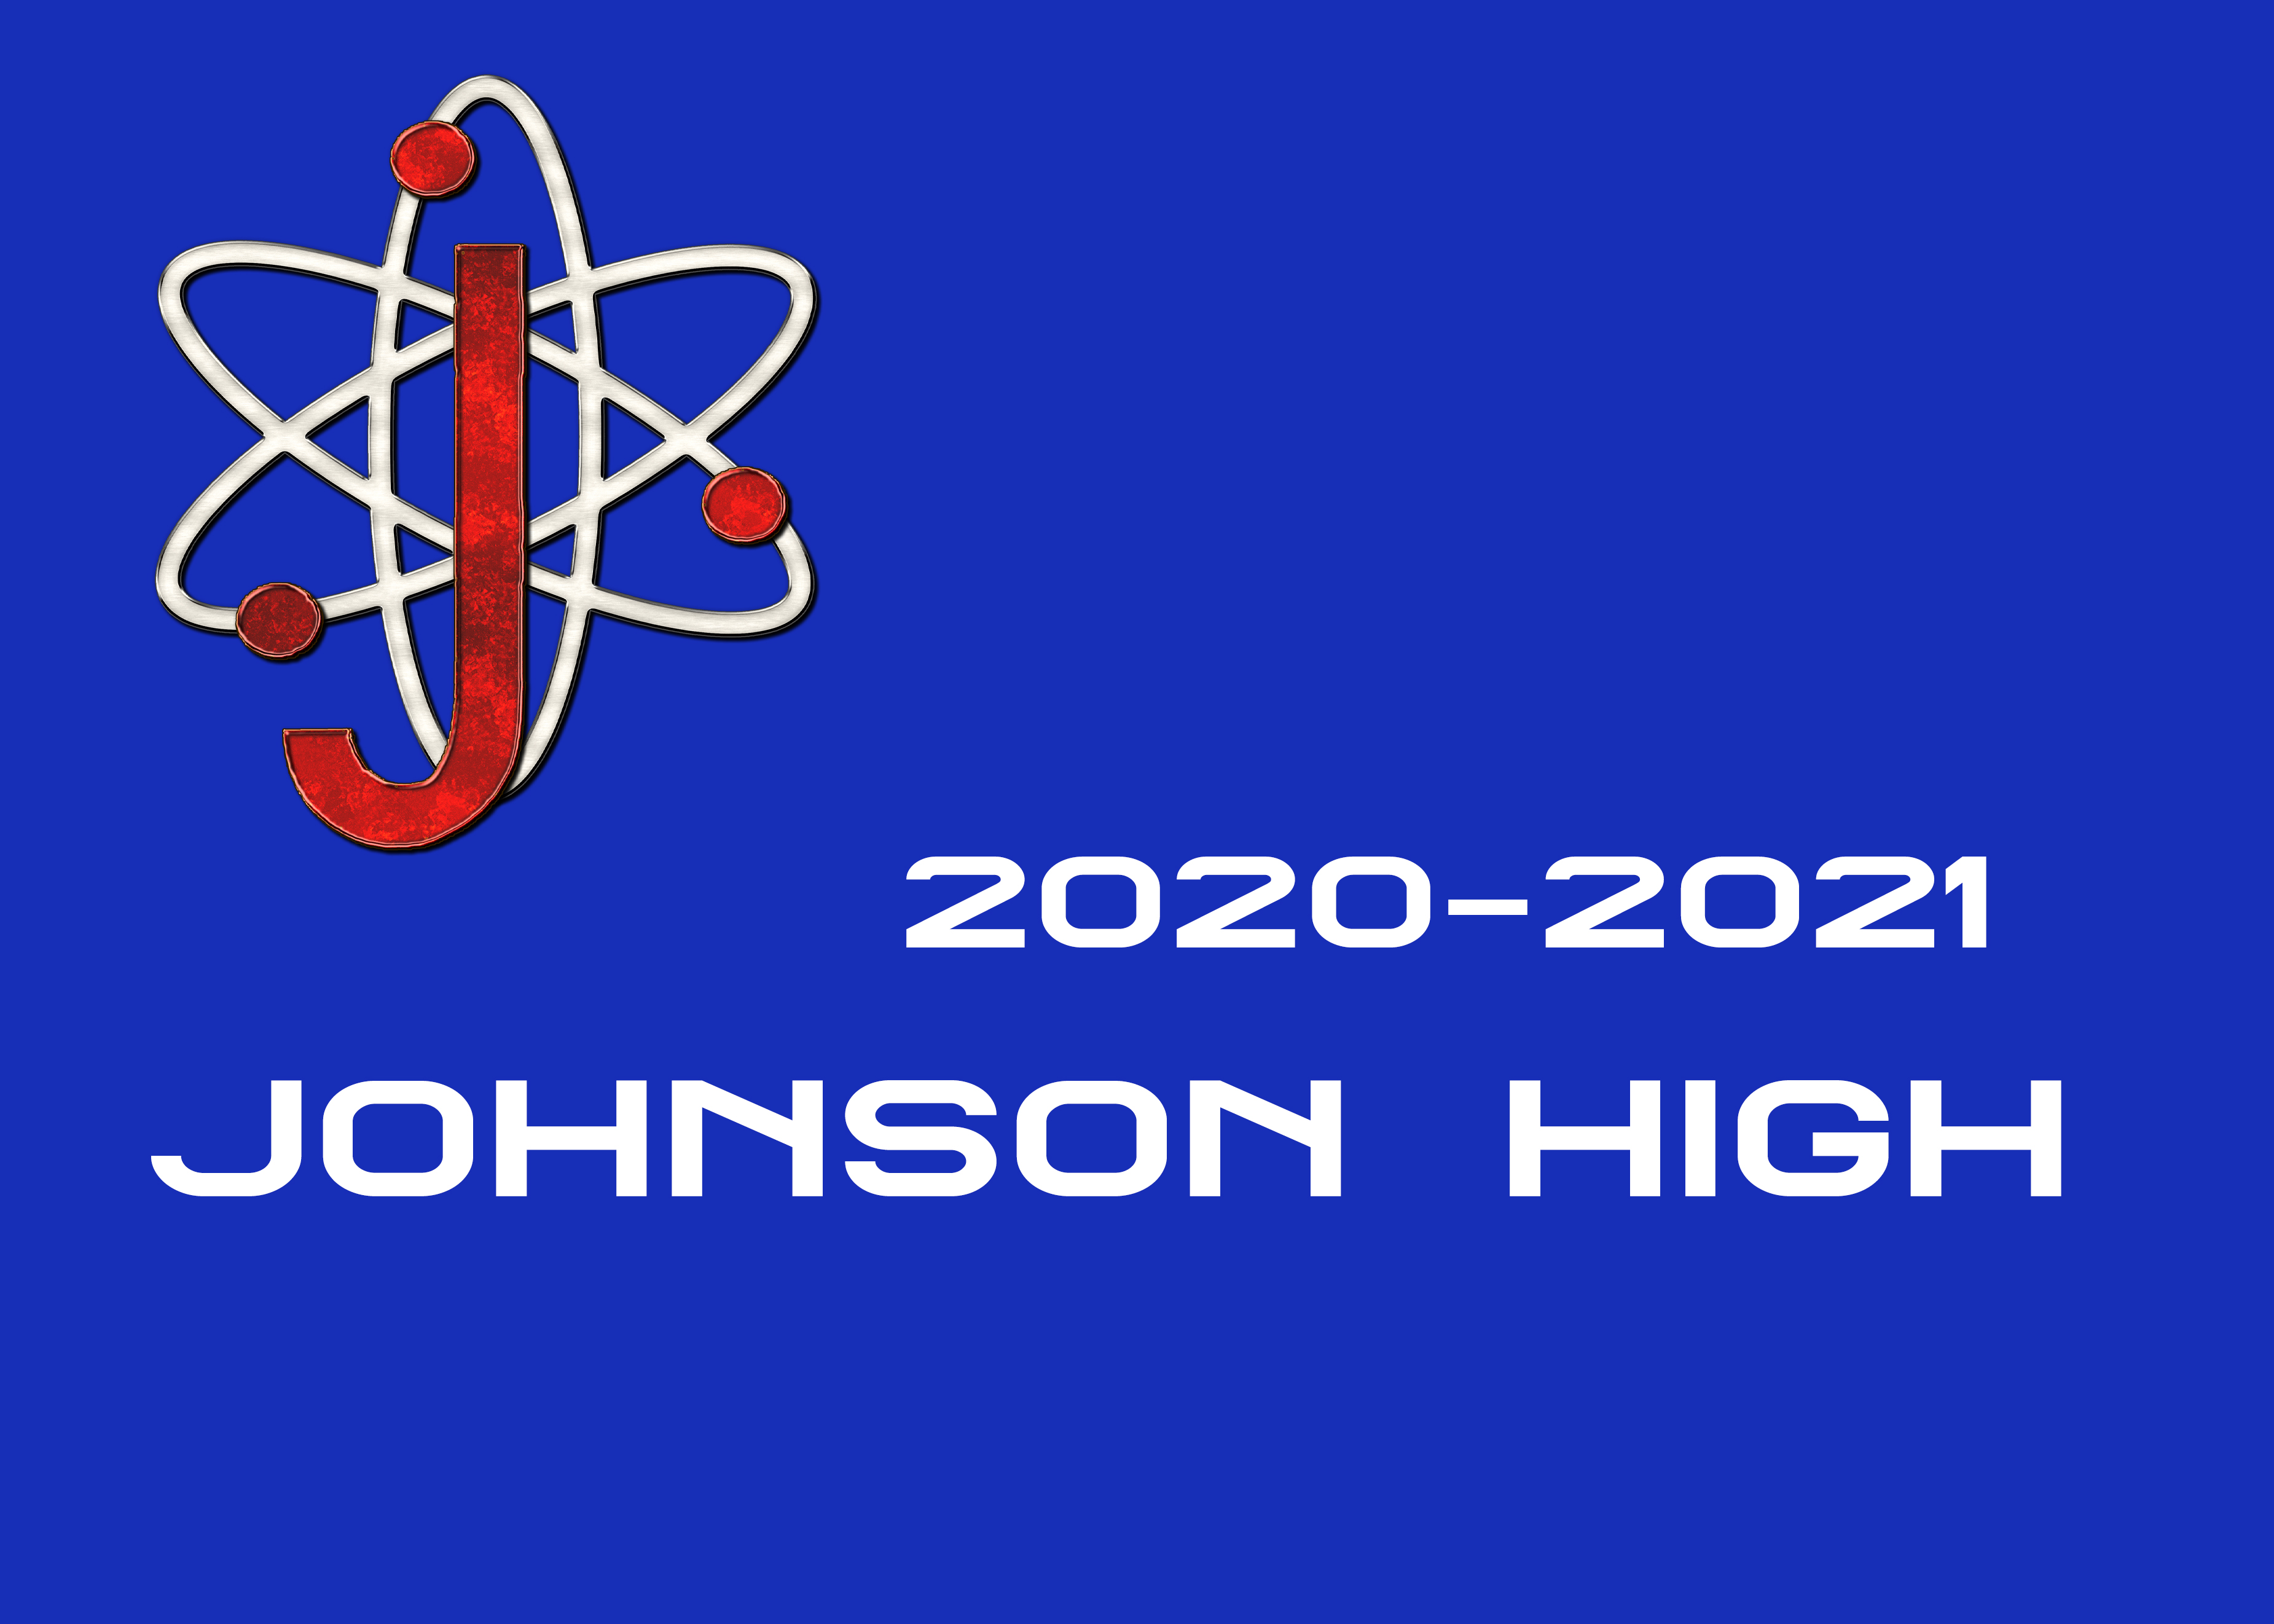 Johnson High School